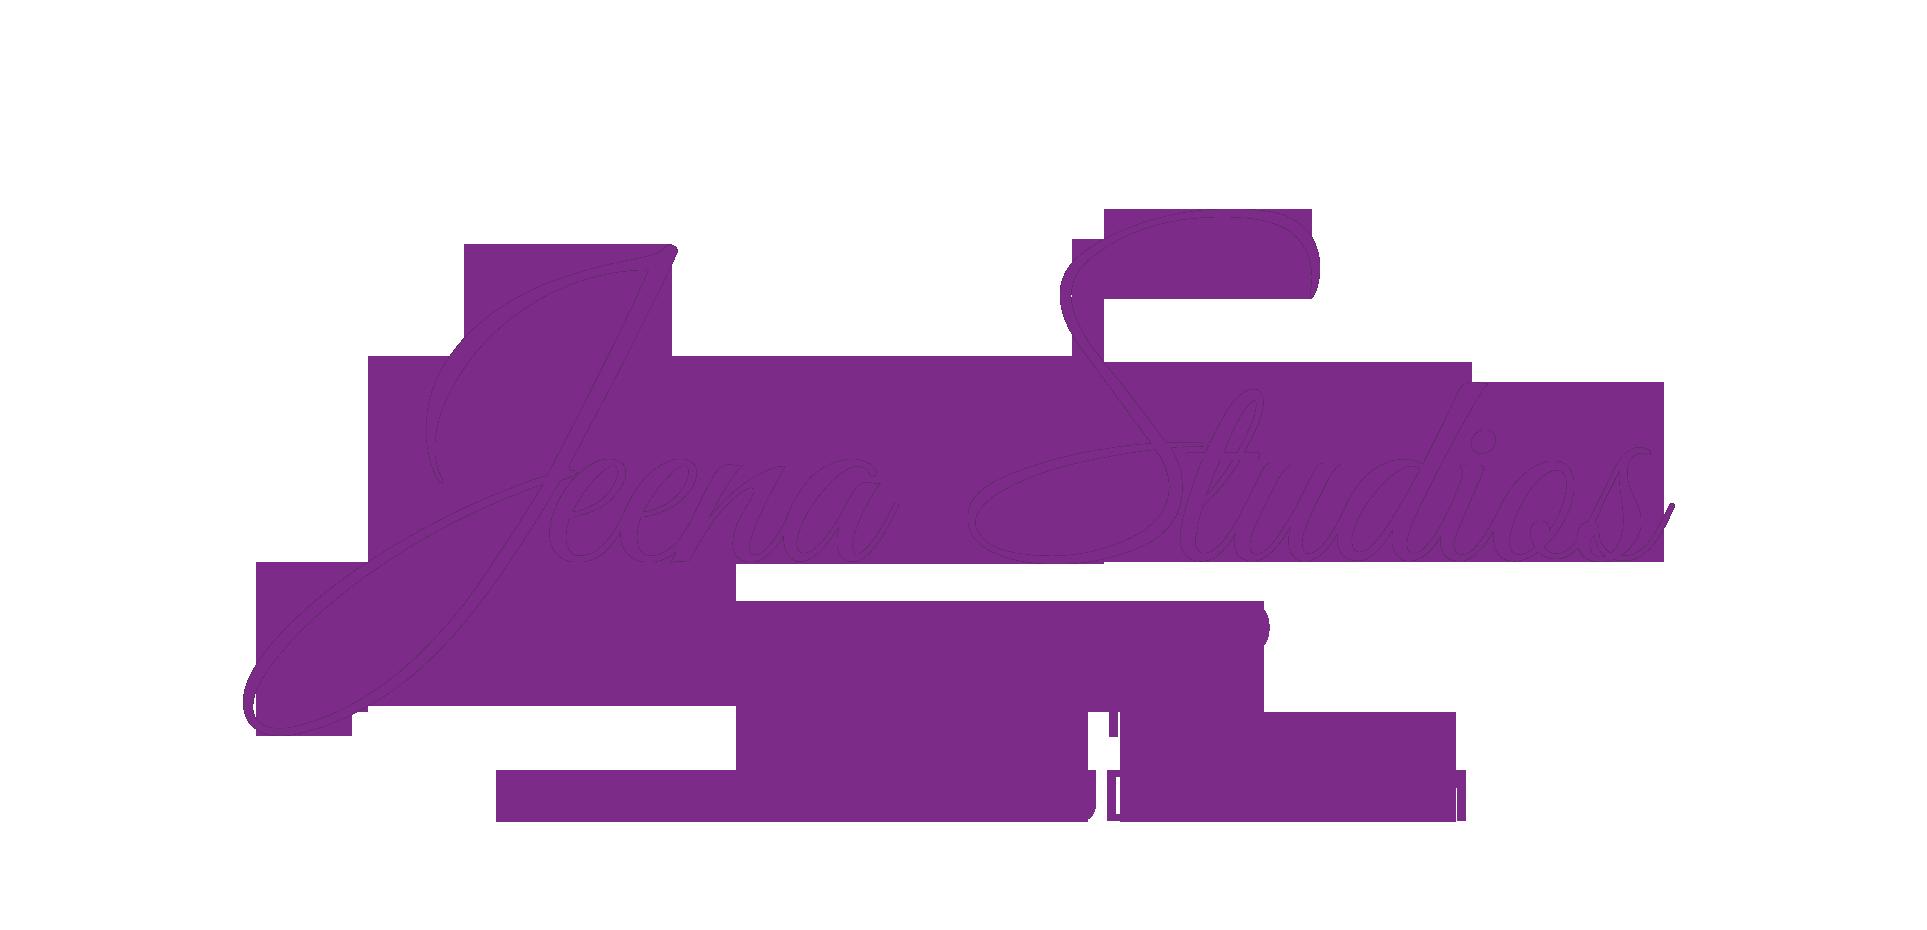 JeenaLogopurplephotoandvideocontactInfo.png